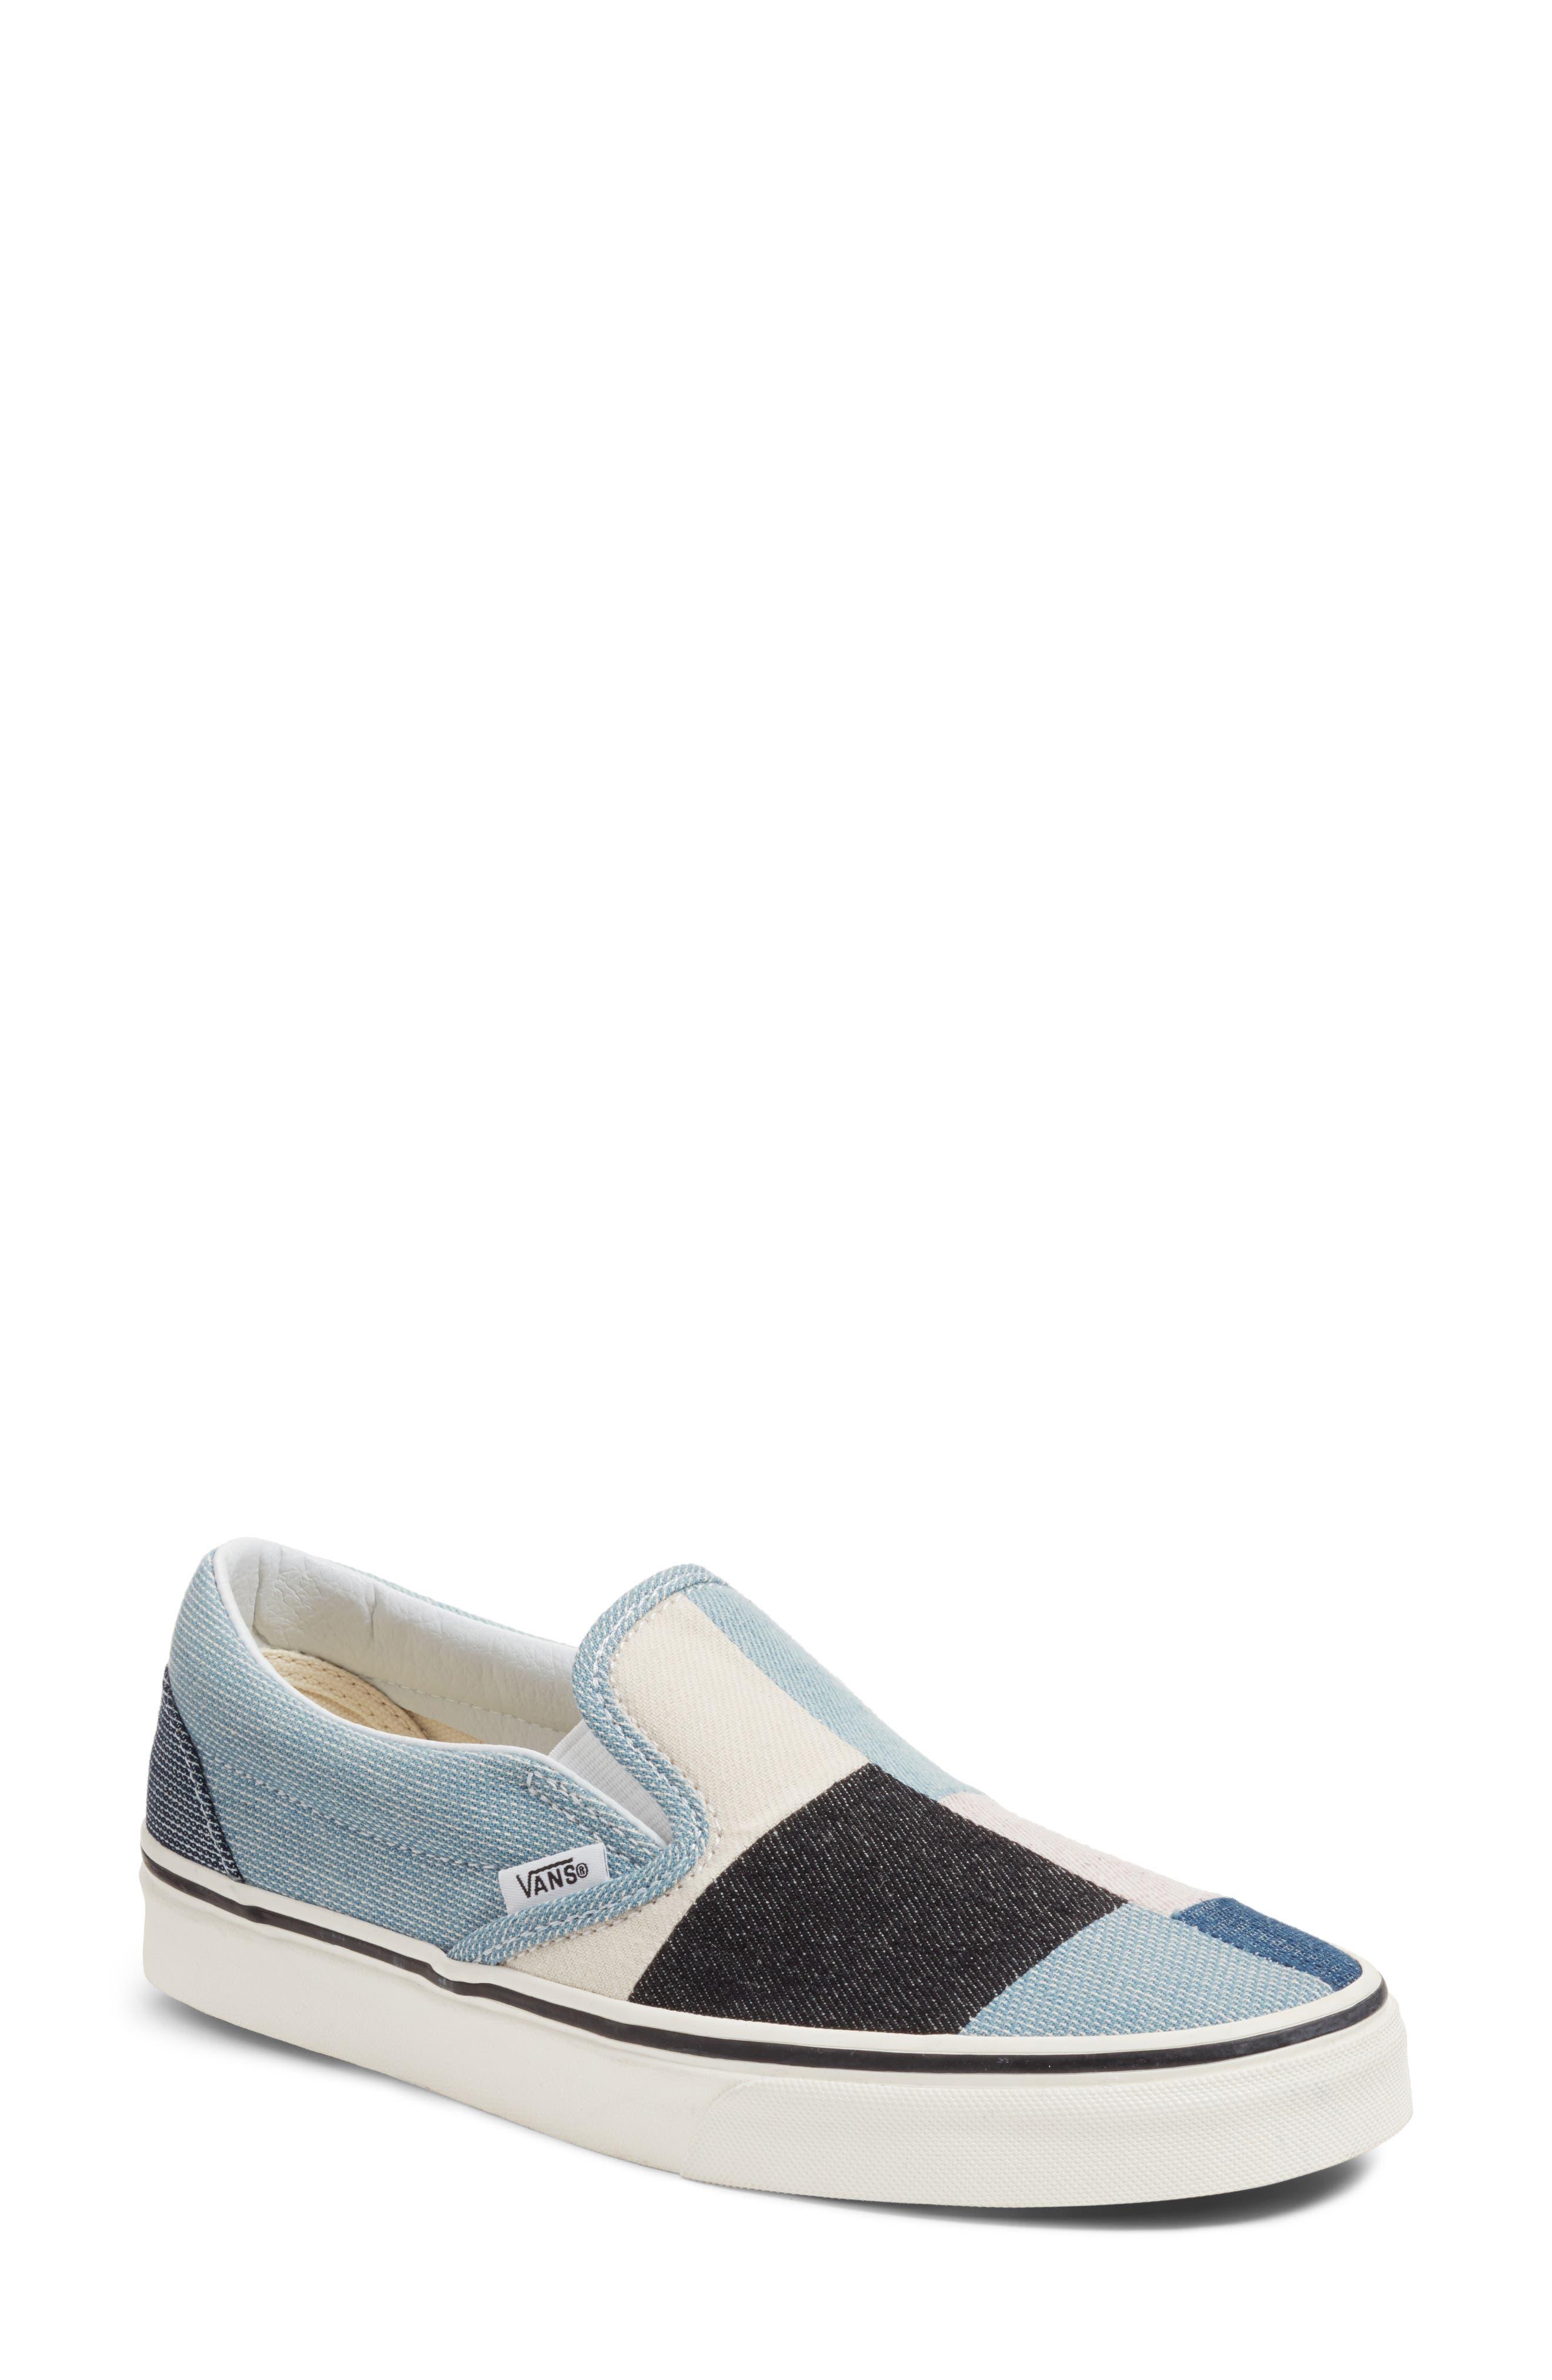 ,                             Classic Slip-On Sneaker,                             Main thumbnail 159, color,                             423